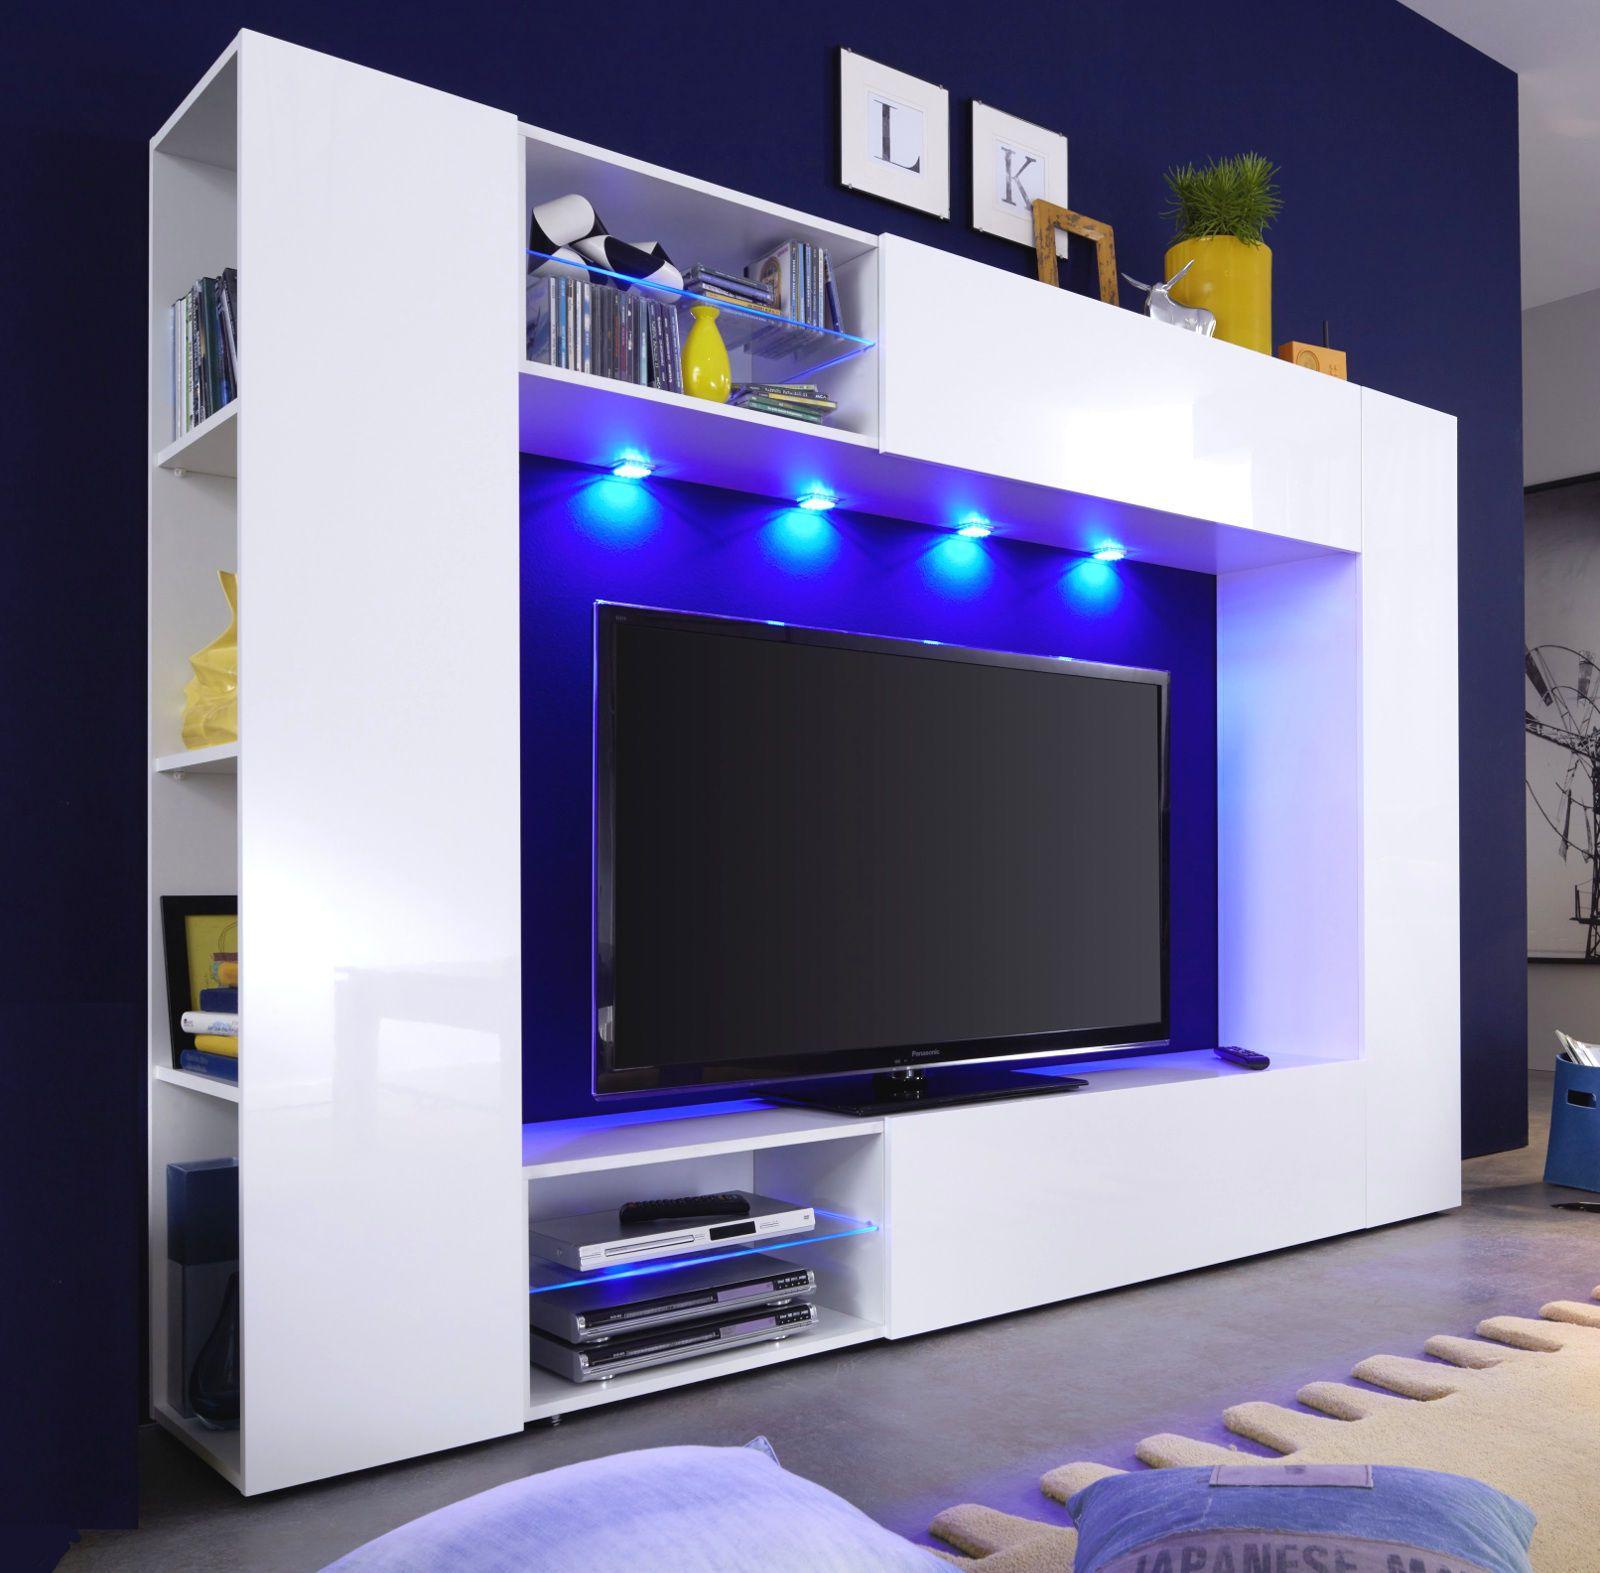 wohnwand mediawand weiss hochglanz fernsehschrank tv hifi medienwand